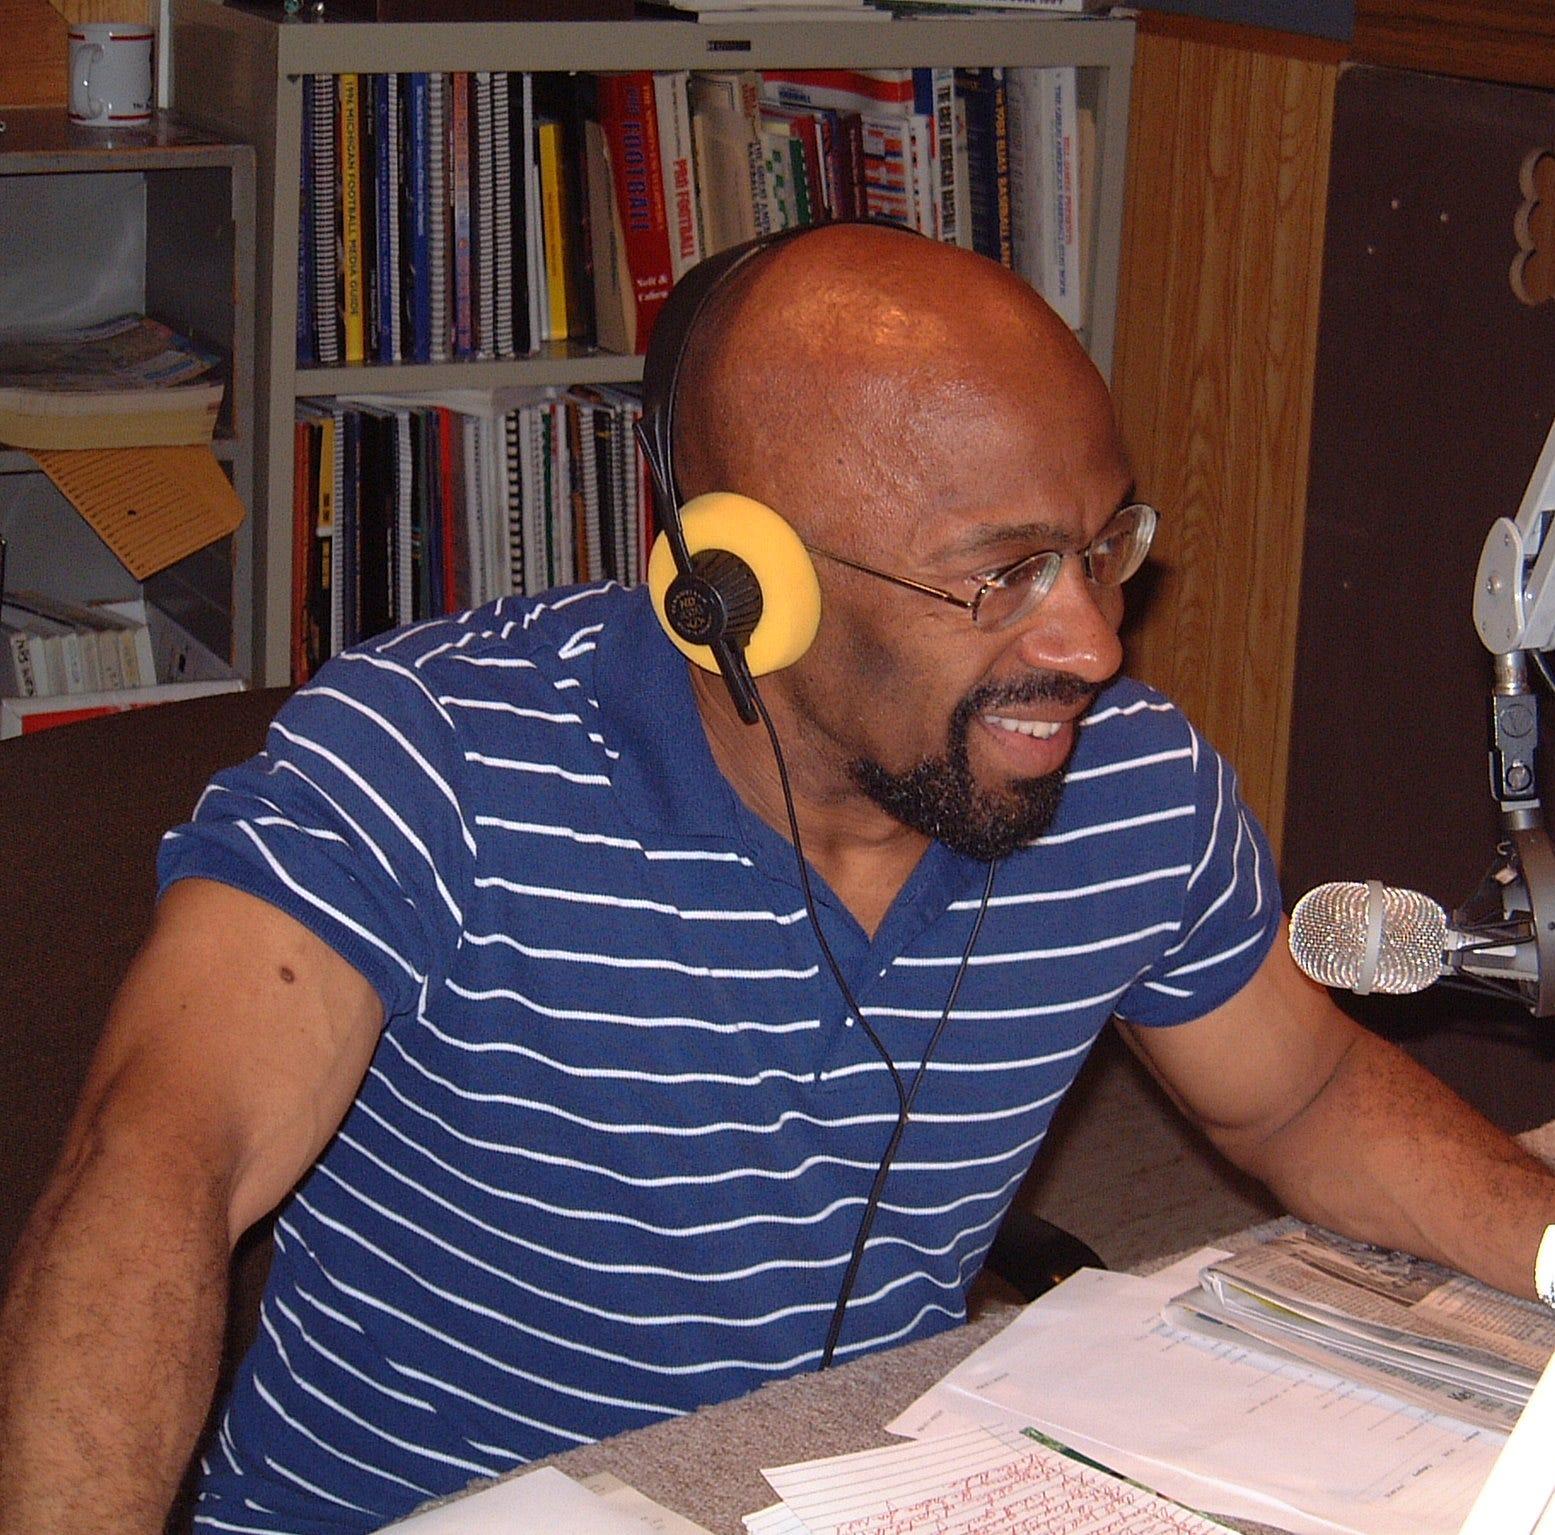 Earle Robinson, veteran WKAR sports radio broadcaster at MSU, passes away. He was 71